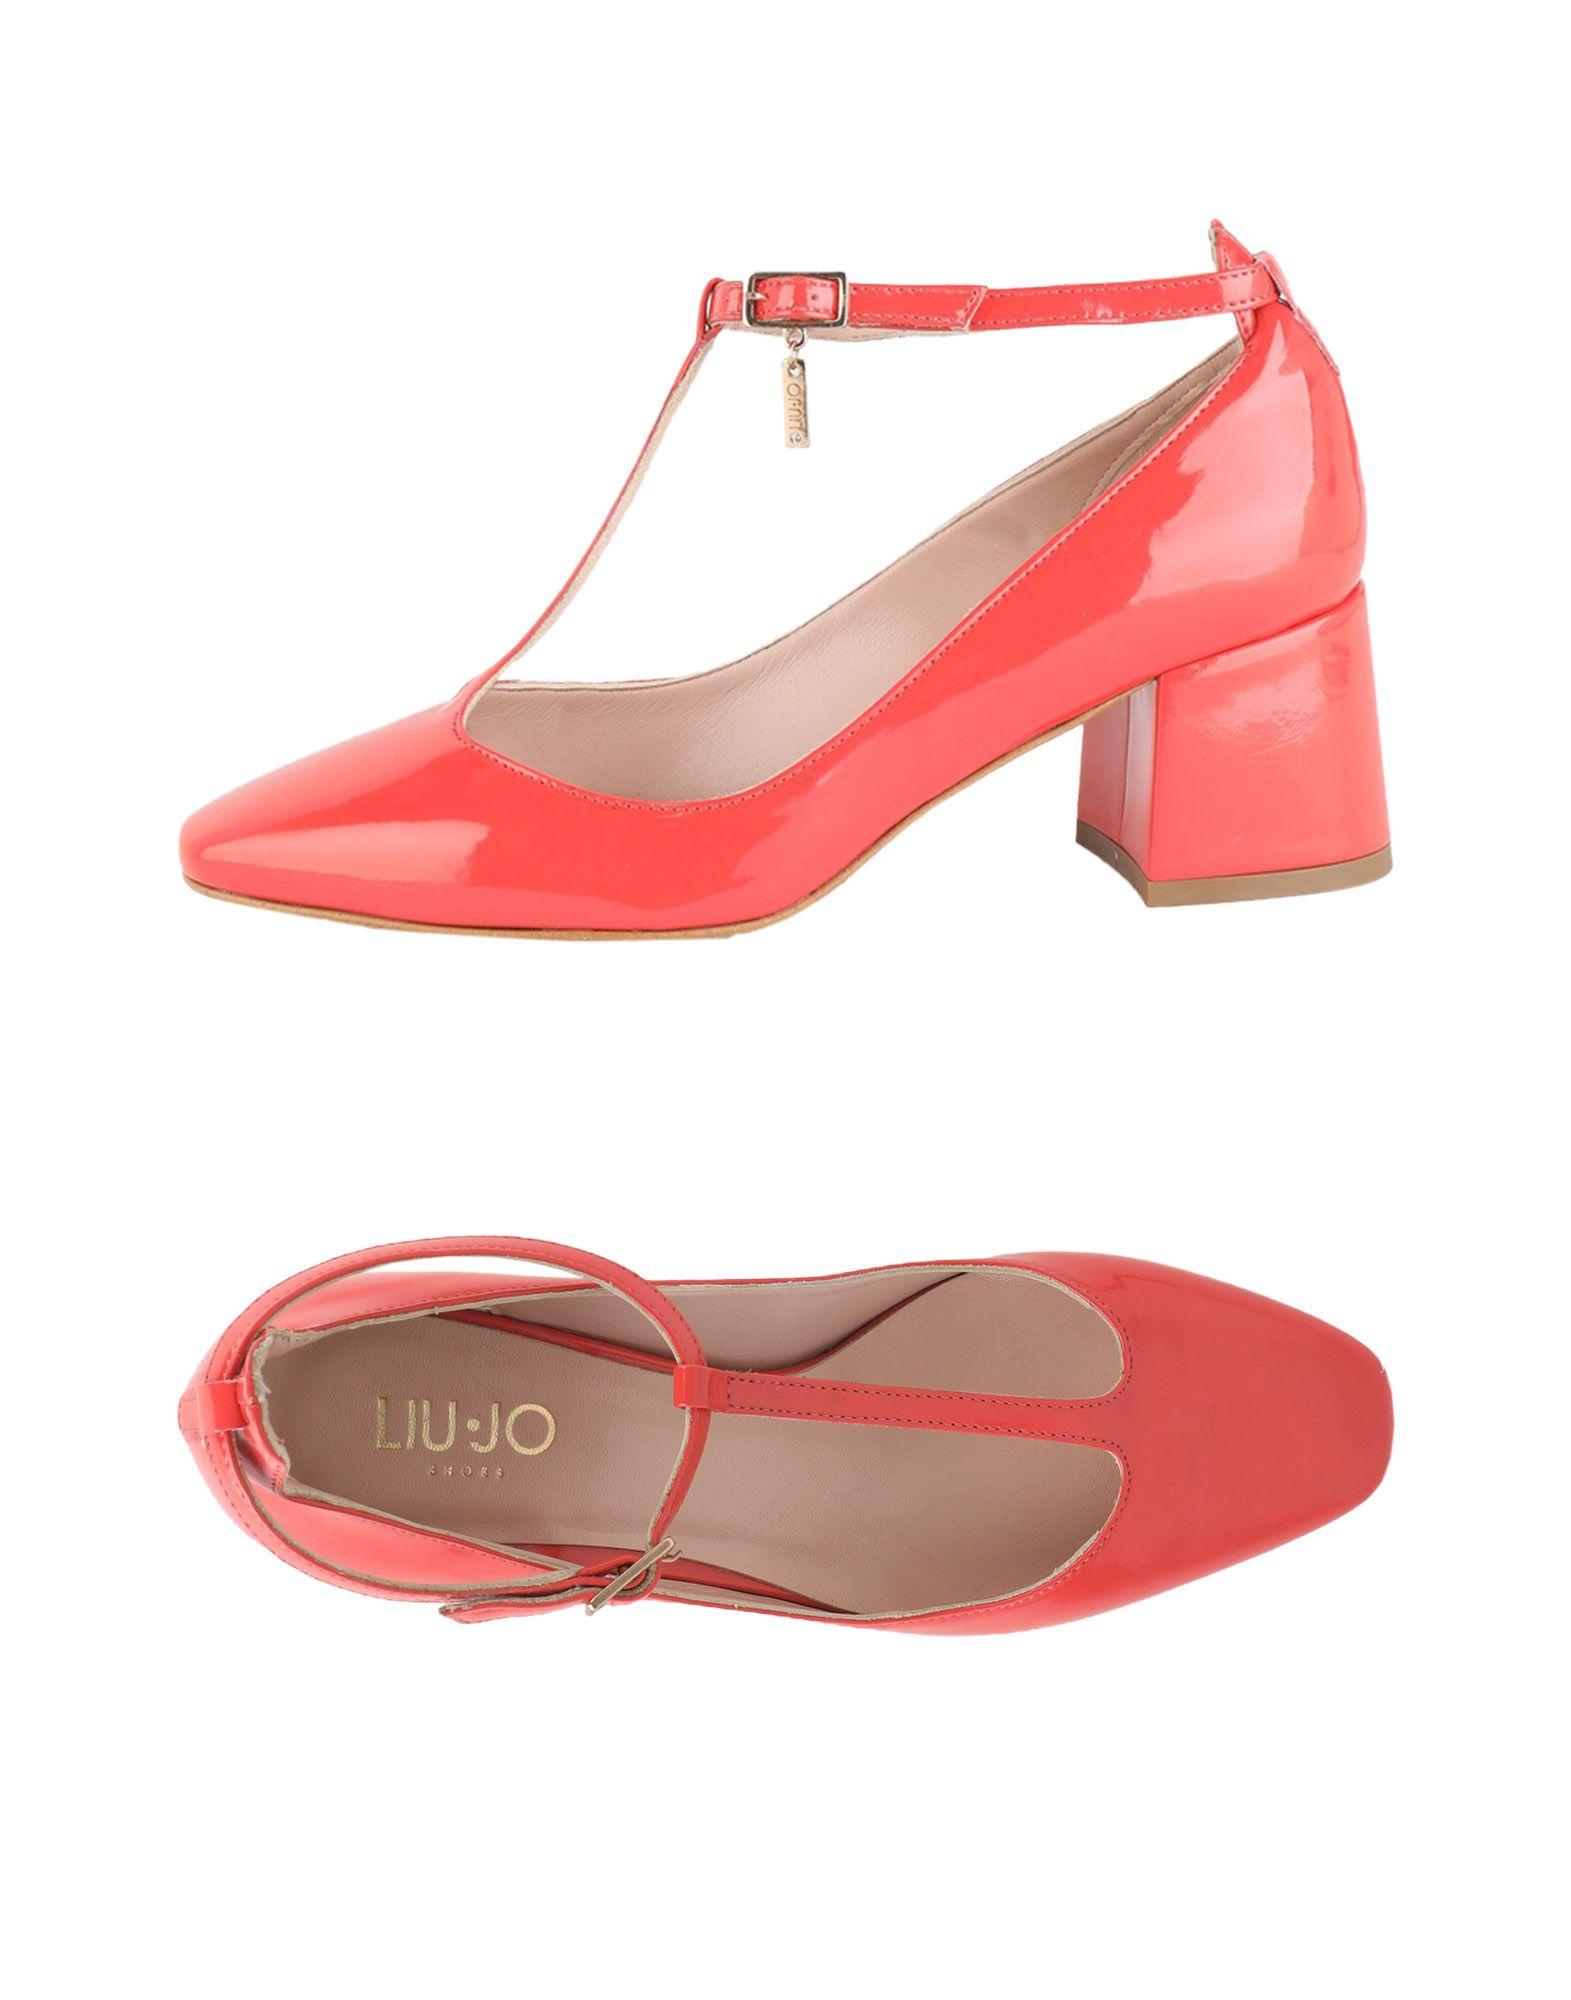 Liu •Jo Shoes Pumps Damen  11369398PL Gute Qualität beliebte Schuhe